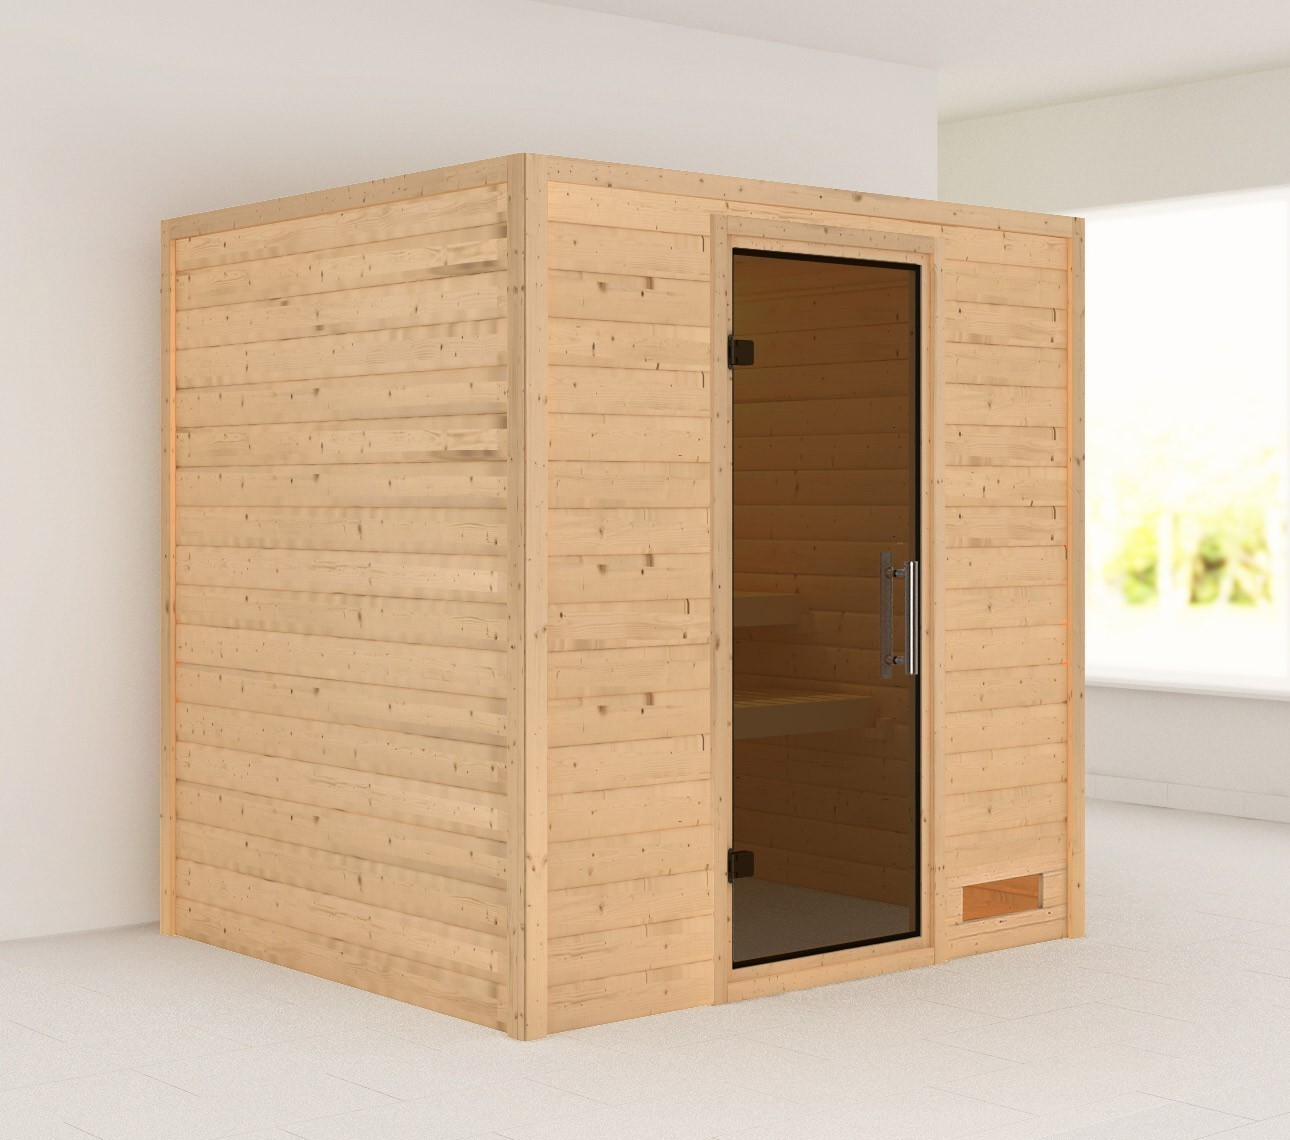 Woodfeeling Sauna Anja 38mm ohne Ofen moderne Tür Bild 1